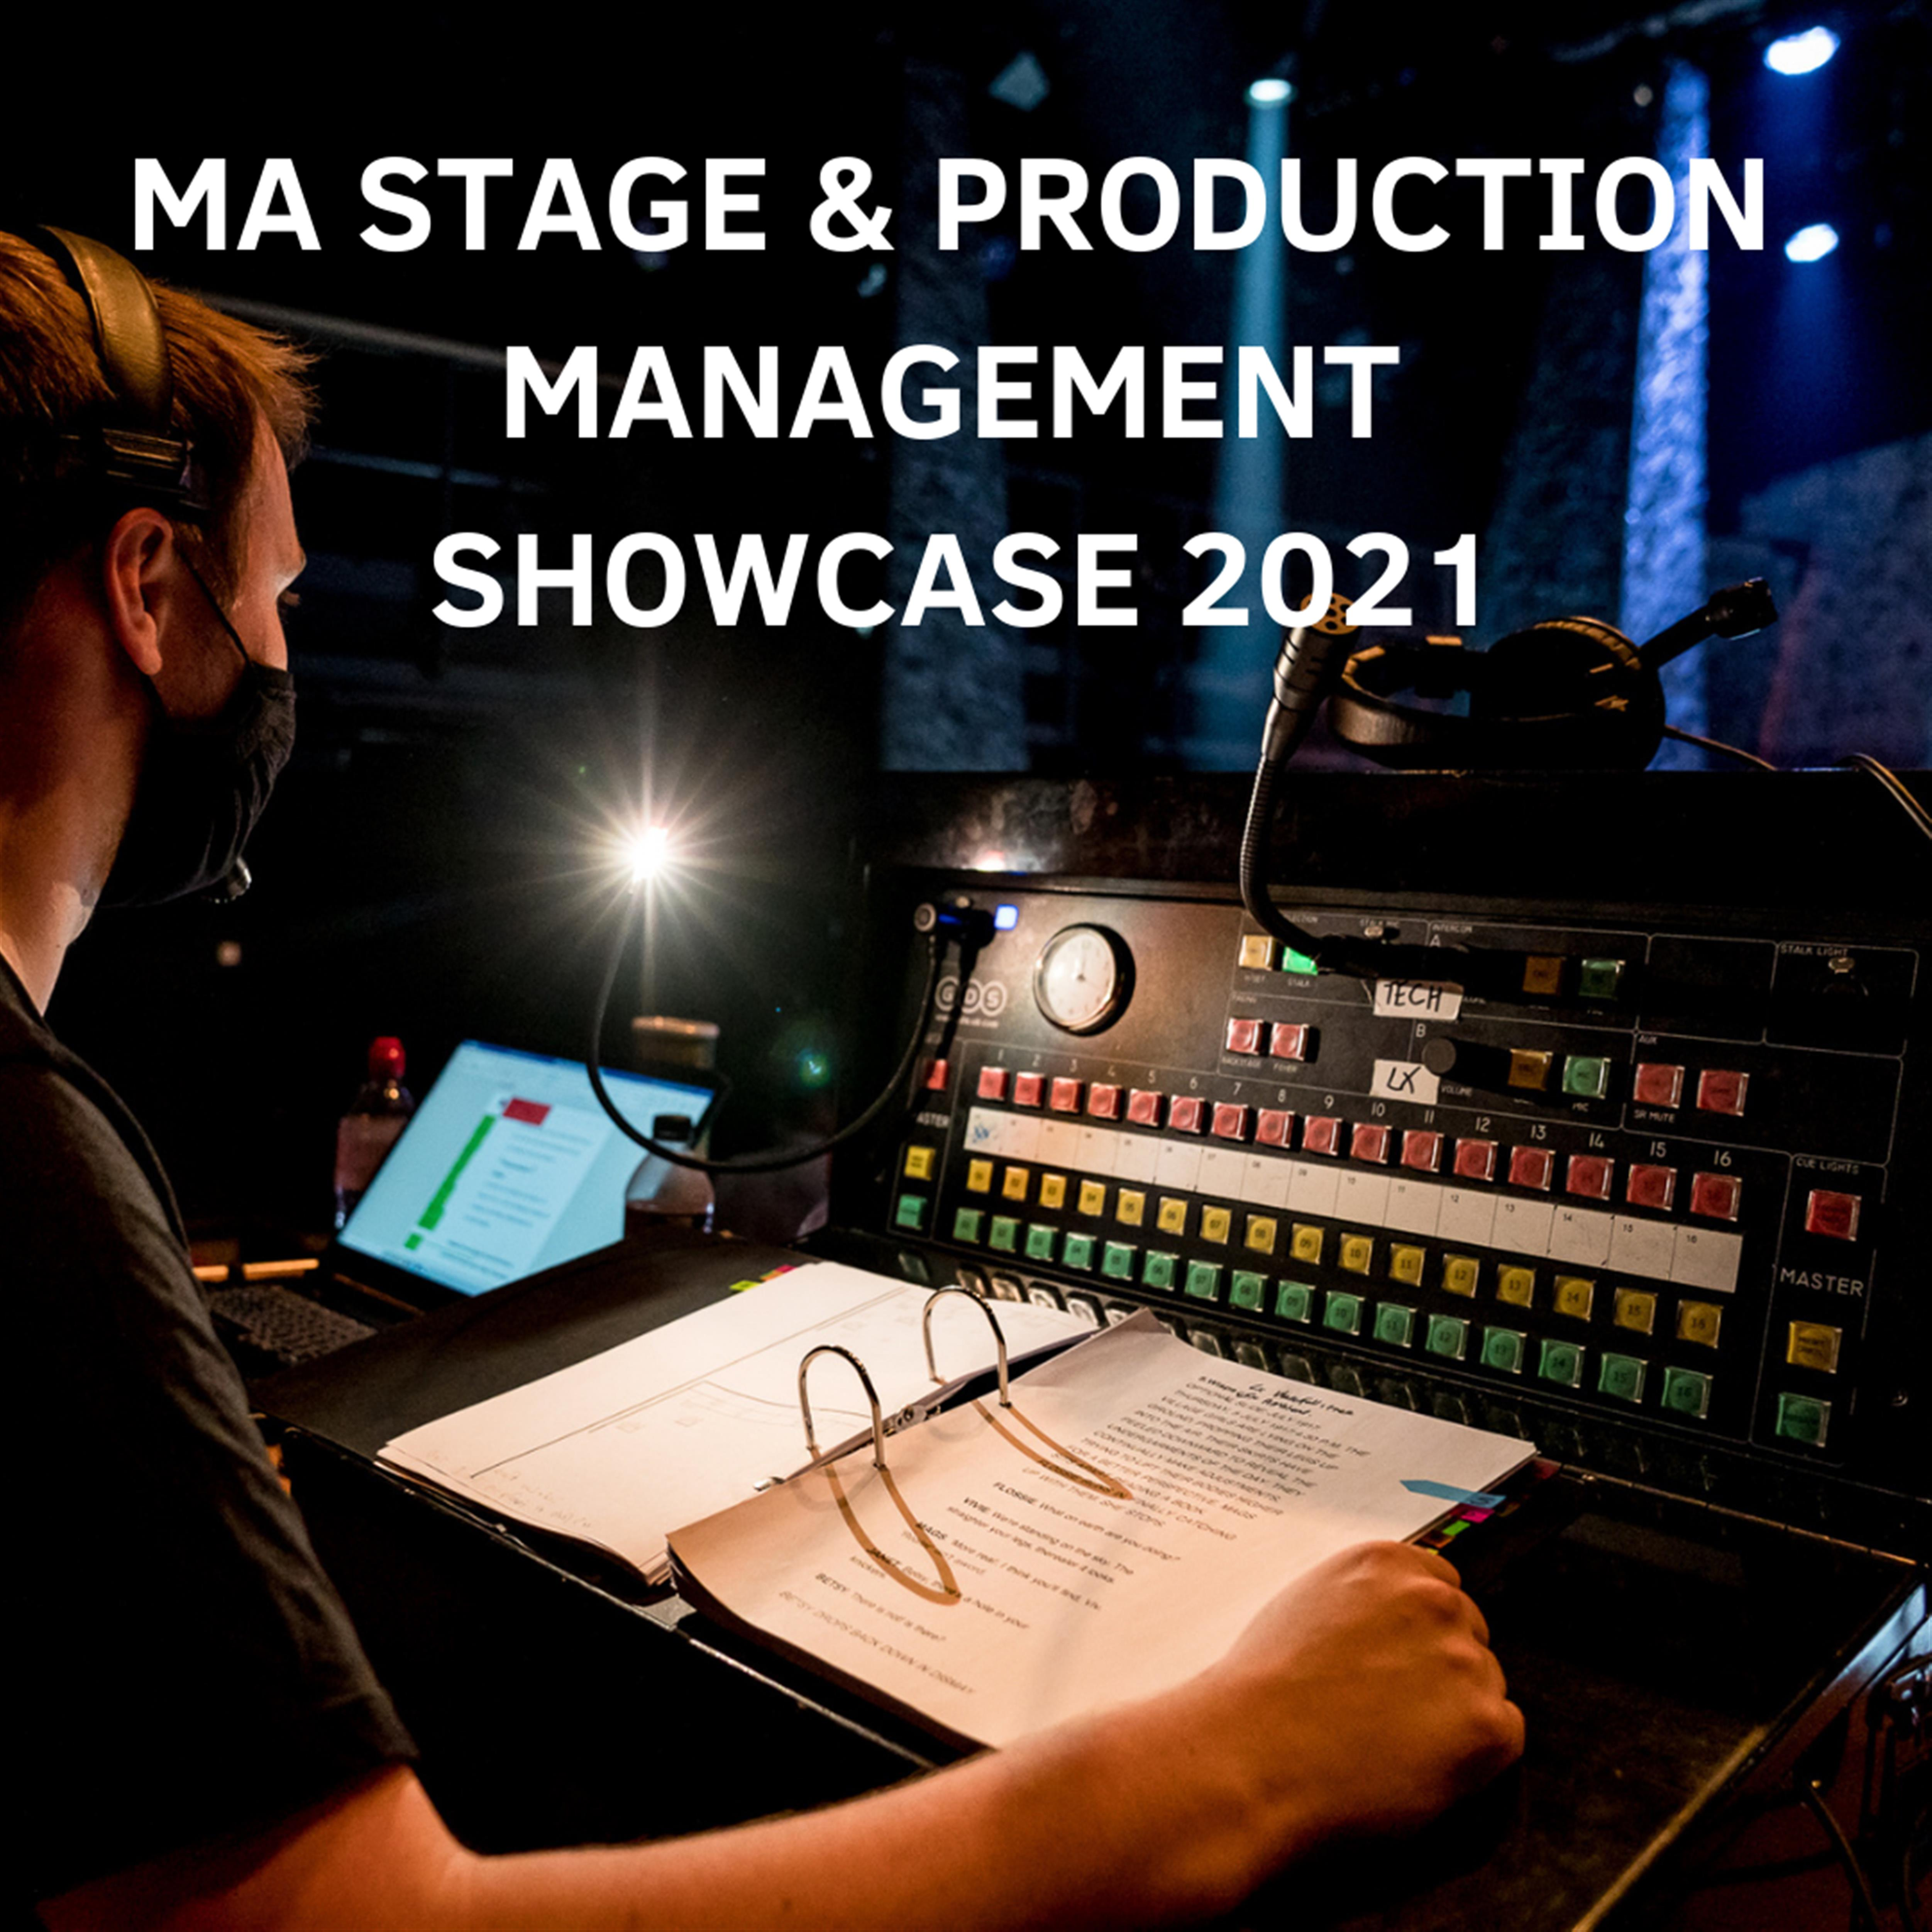 MA Stage & Production Management Showcase